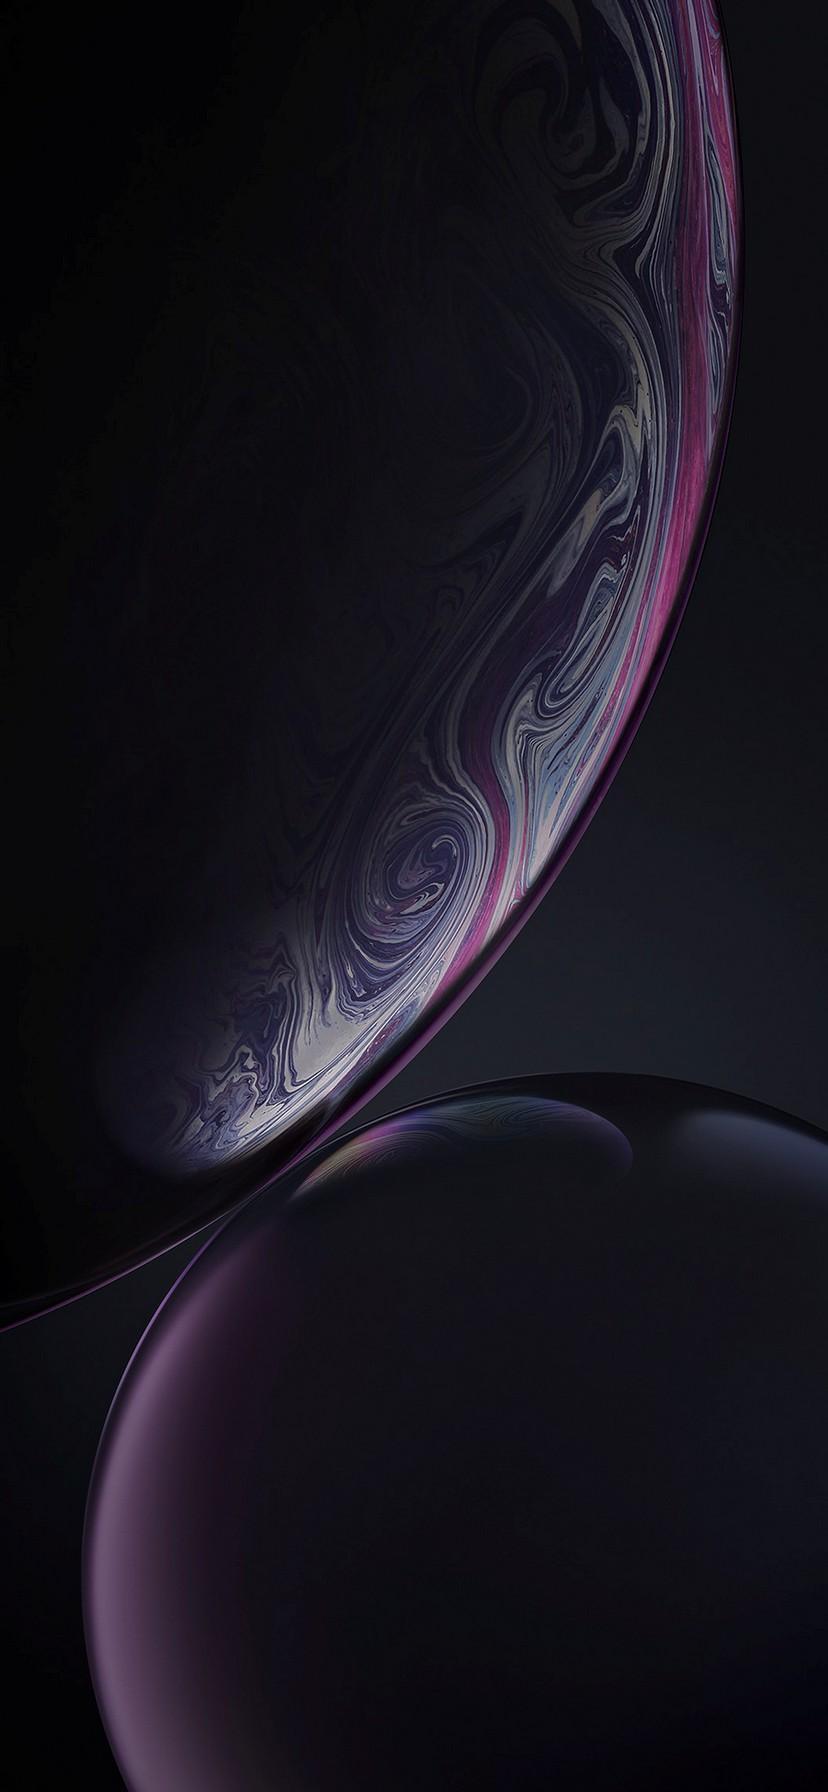 Lock Screen iPhone Wallpapers ...